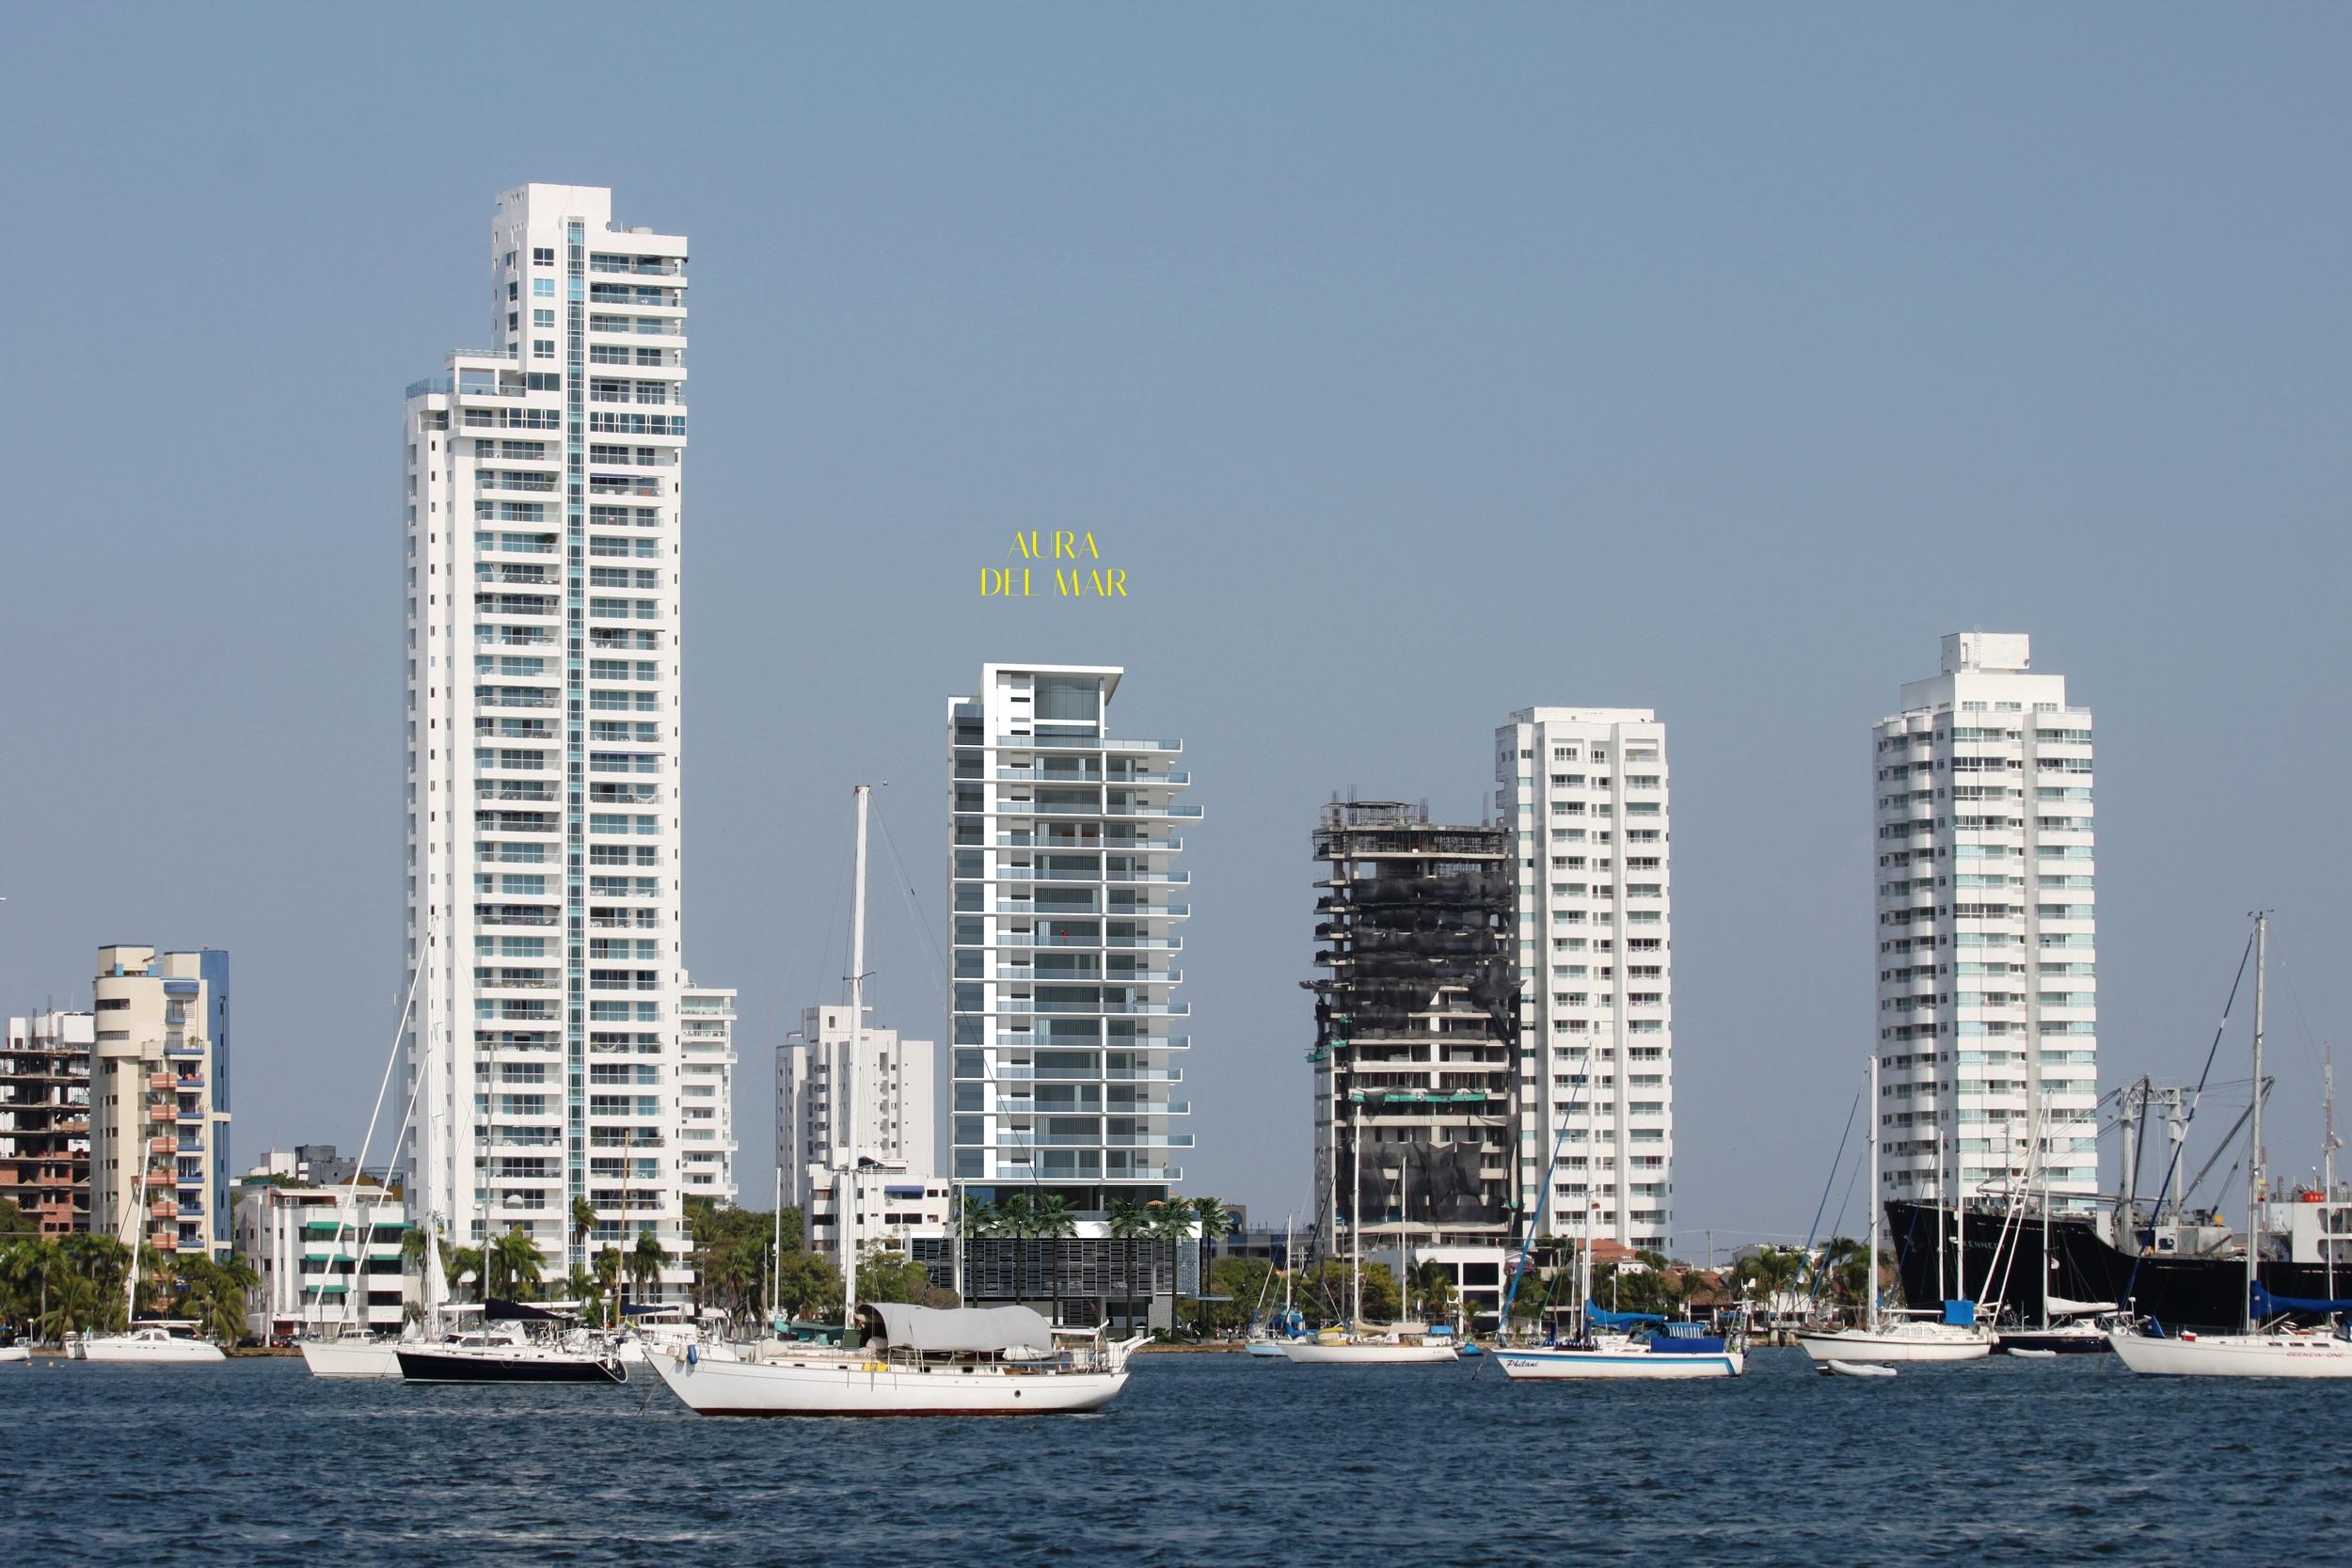 Aura del Mar (Cartagena) (6).jpg